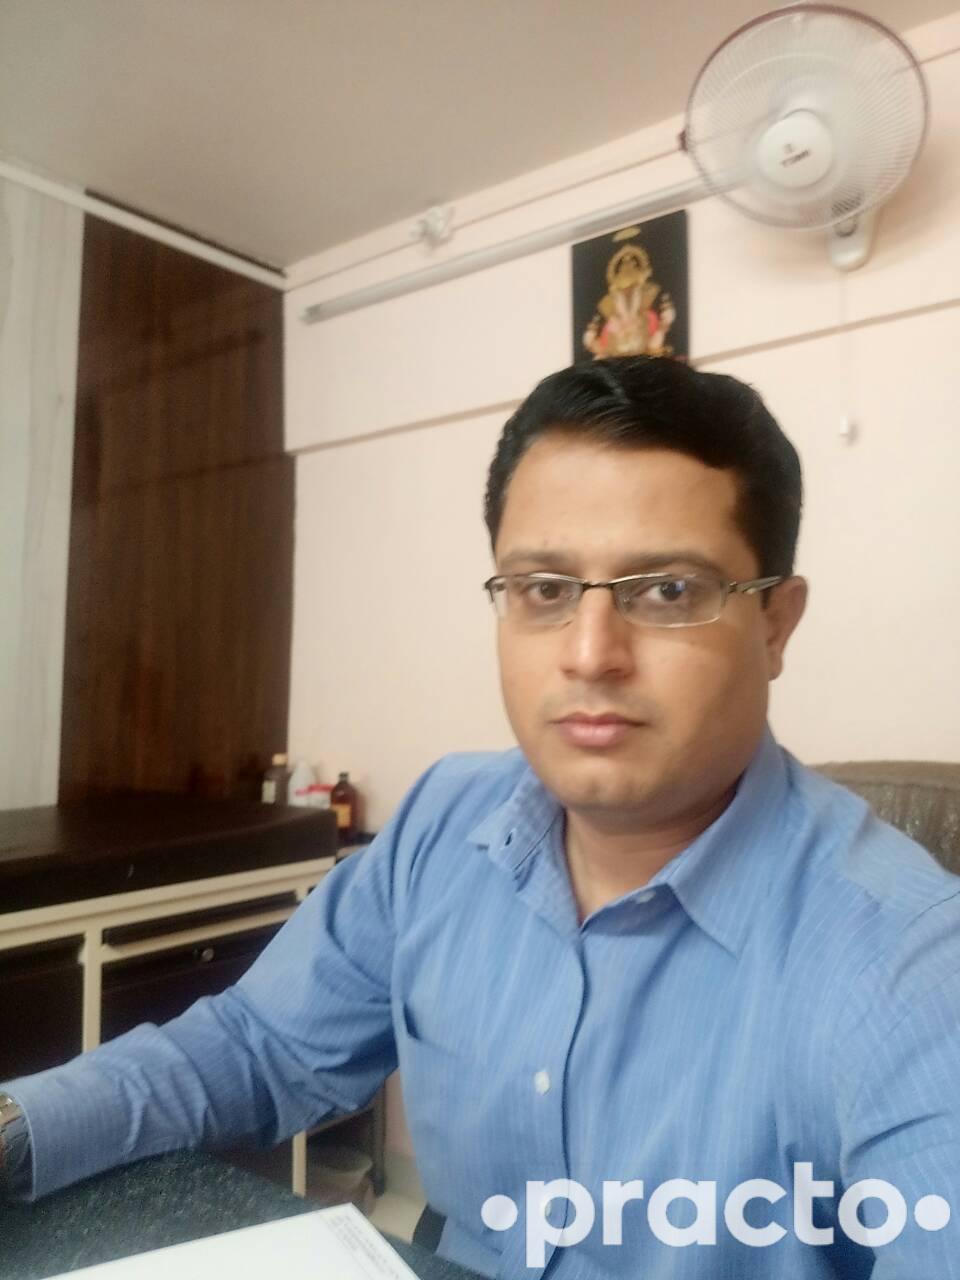 Dr. Anirudha Deshpande - Orthopedist